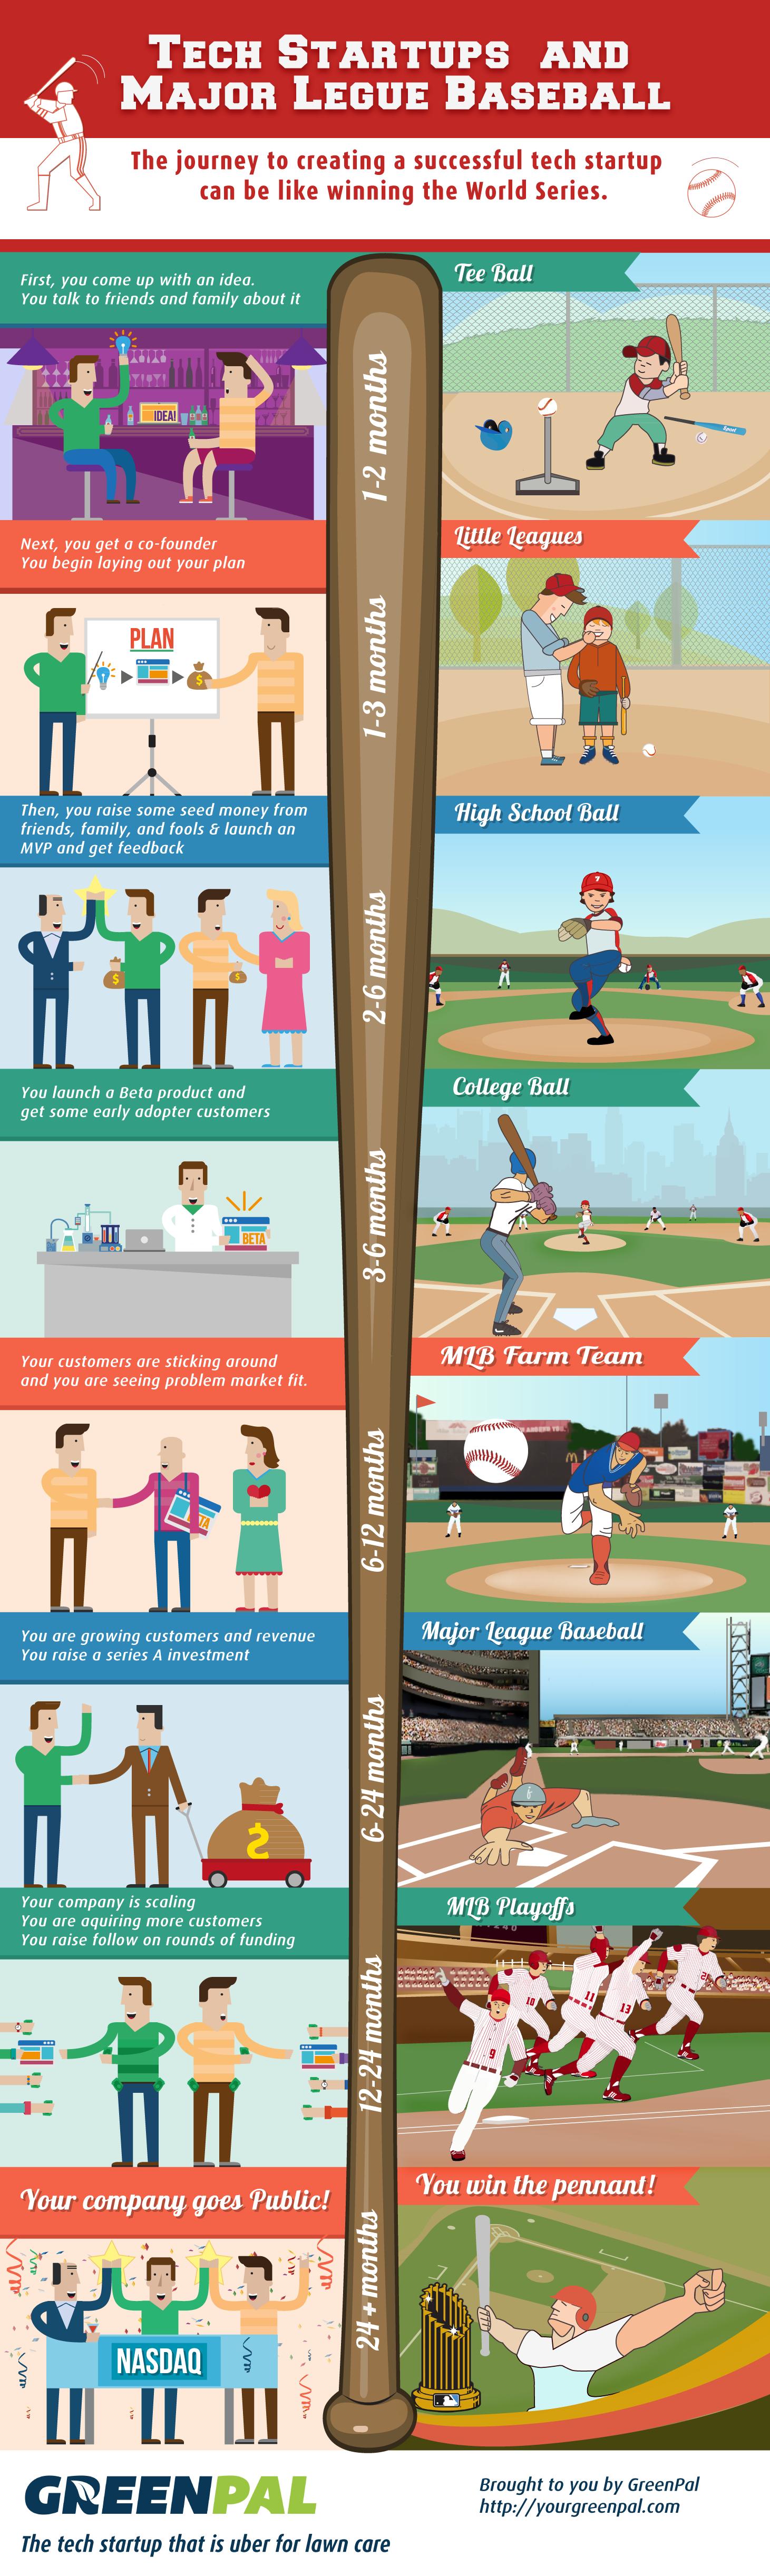 Tech Startups and Major League Baseball